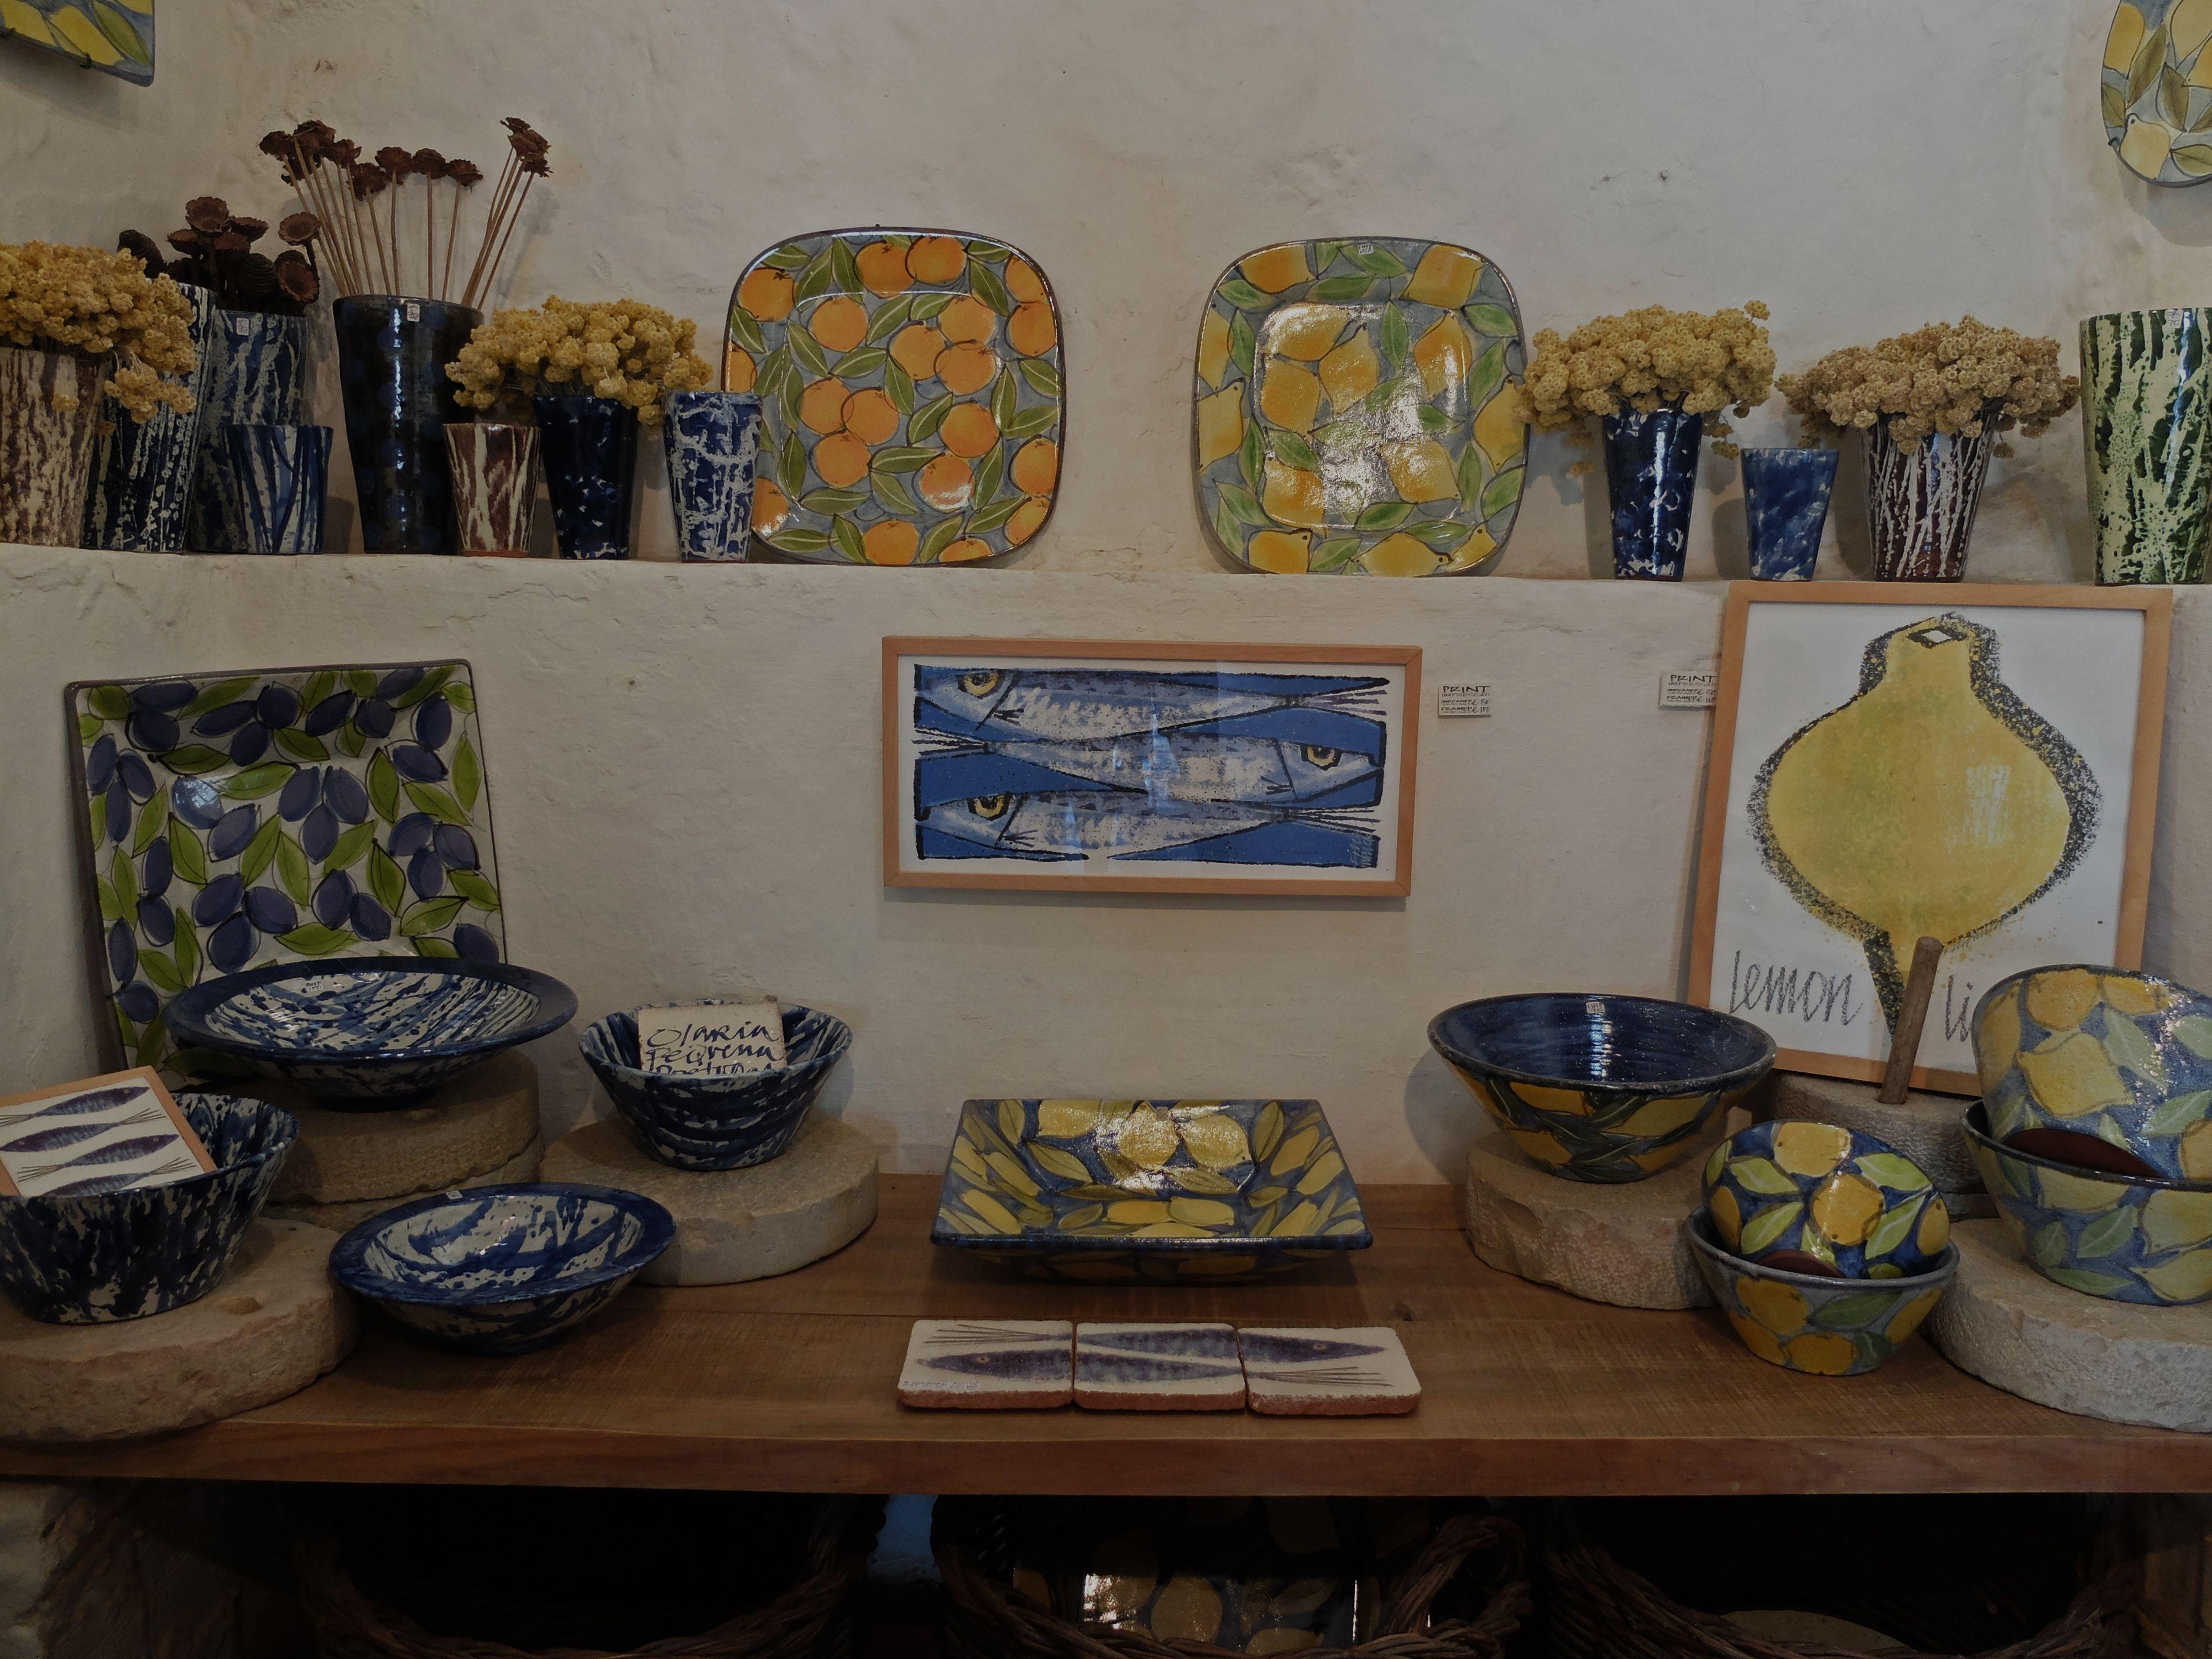 Olaria pequena, Pottery, Porches, Algarve, Portugal, October 2015, HR